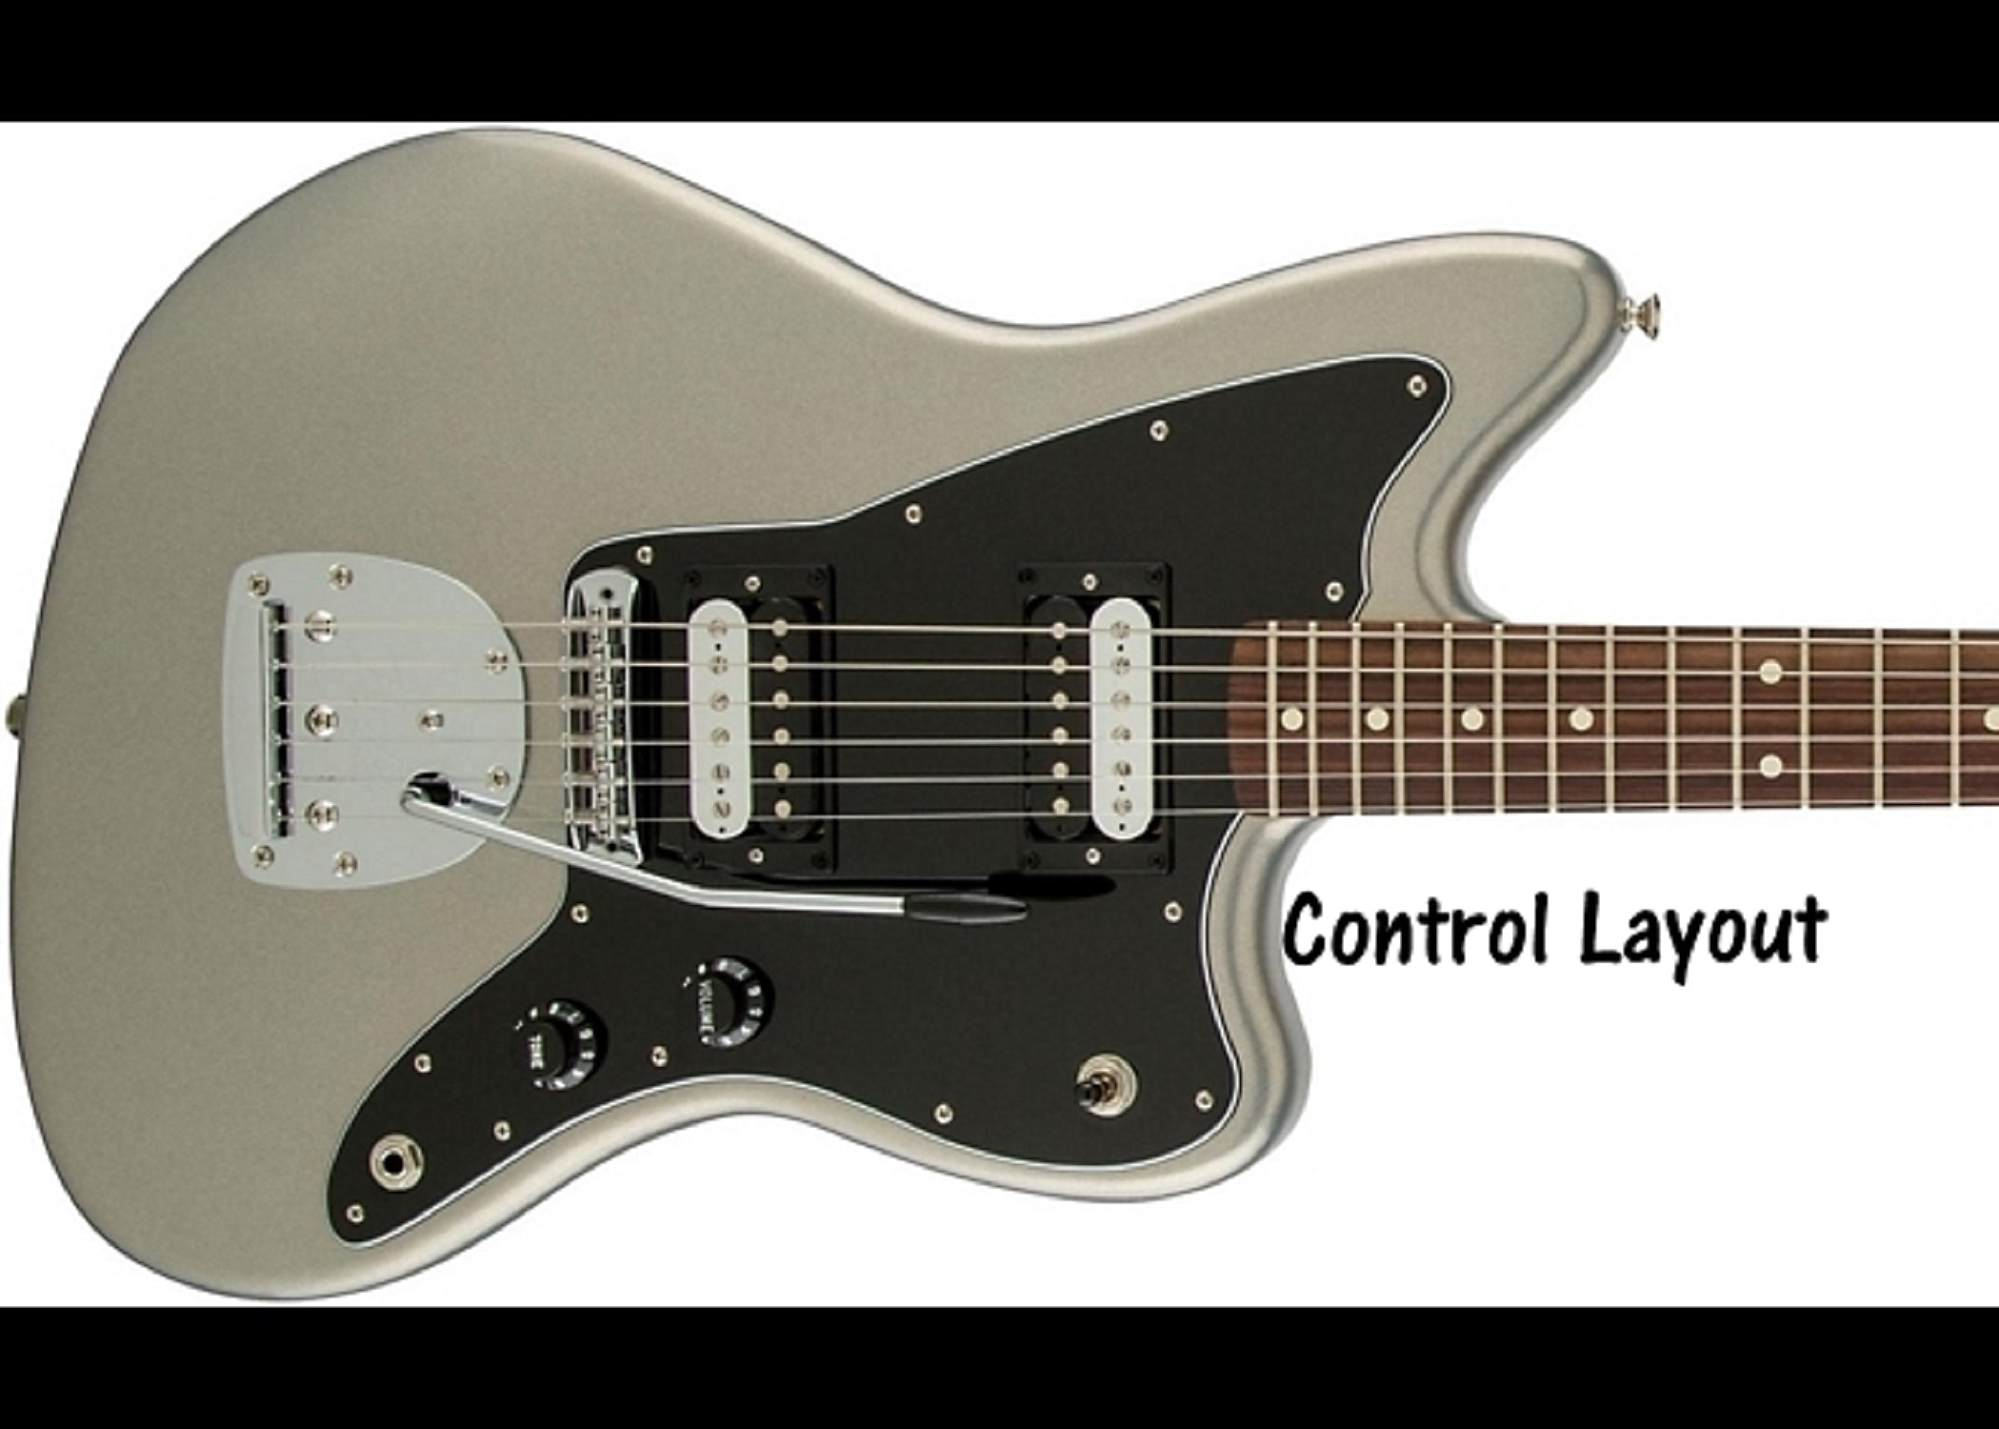 hight resolution of fender standard jazzmaster prewired wiring harness kit 2 controls 3 way switch pio tone cap